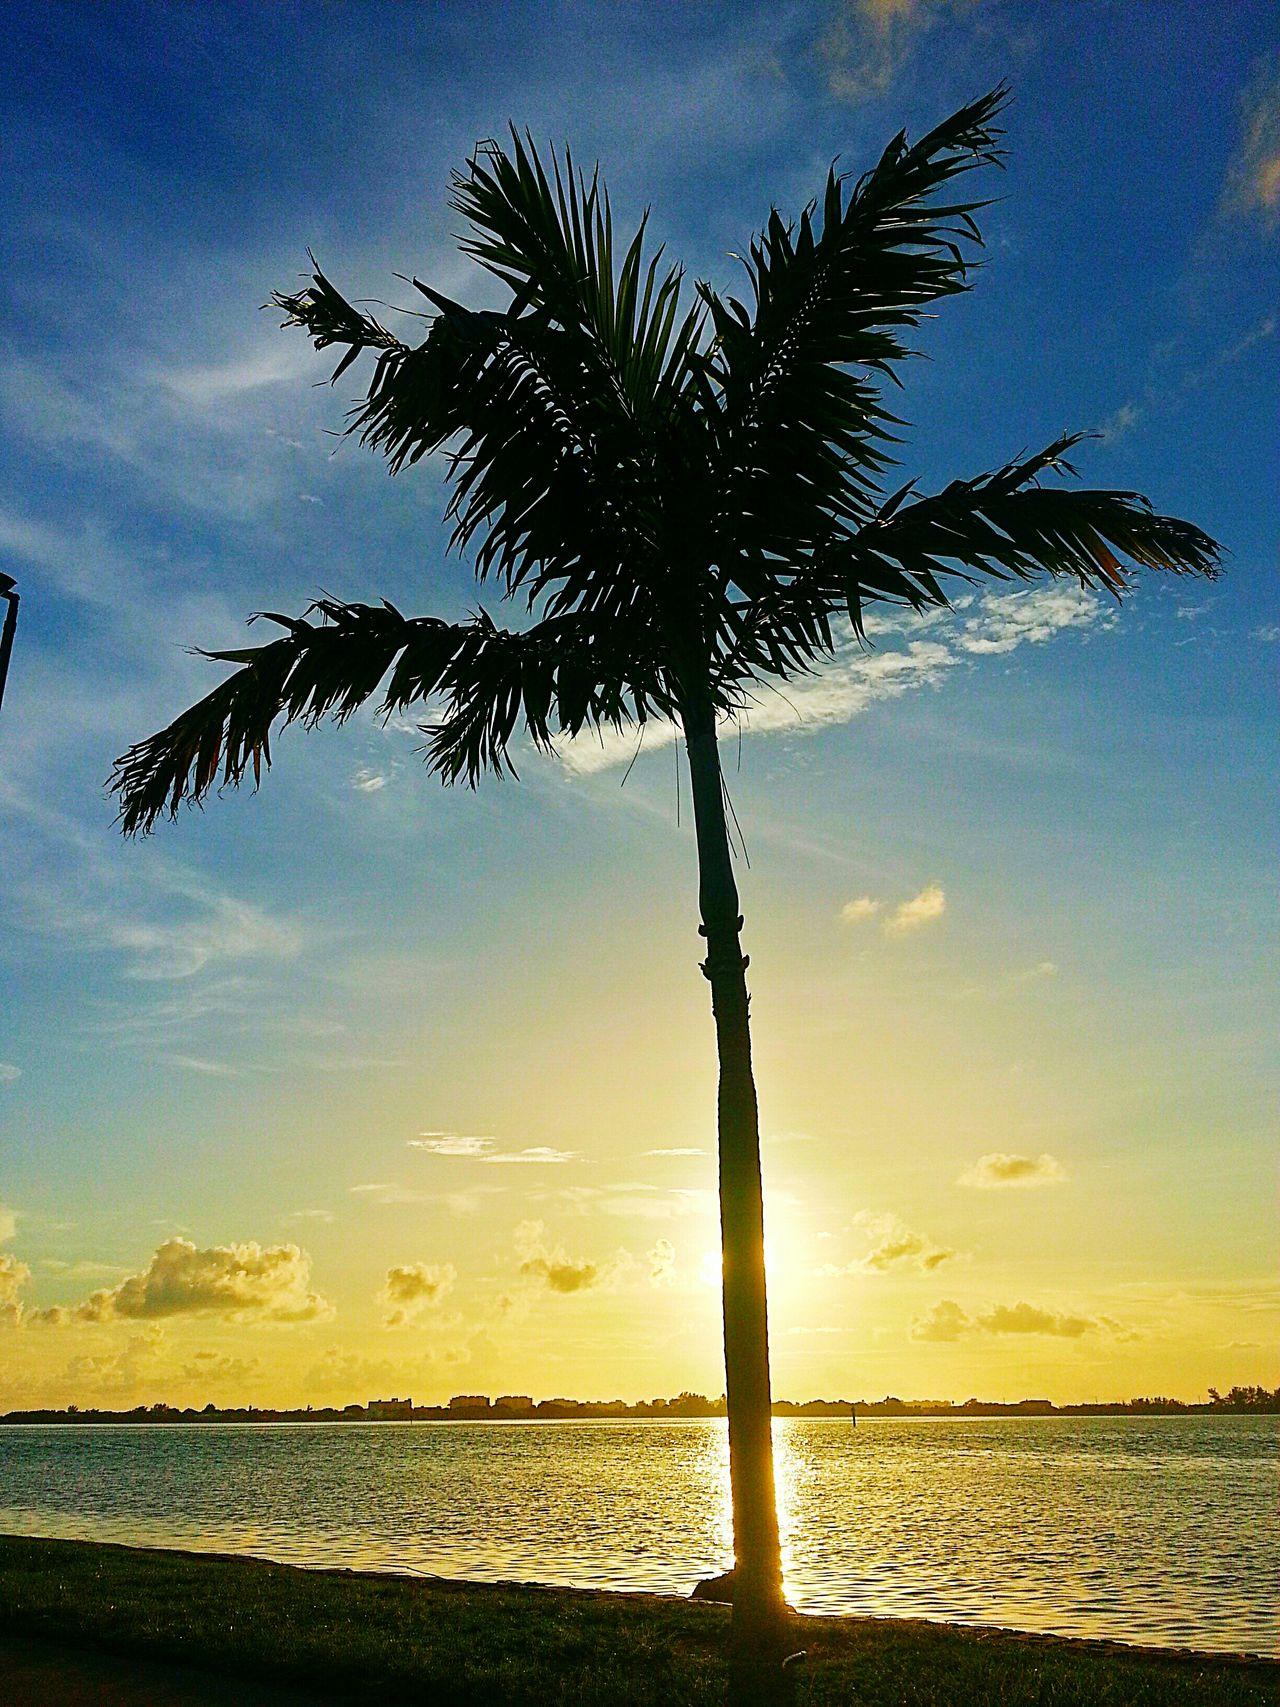 Palm Trees Sunset Sunset_collection Sunset Silhouettes Eye4photography  EyeEm Best Shots EyeEm Best Edits EyeEm Best Shots - Sunsets + Sunrise